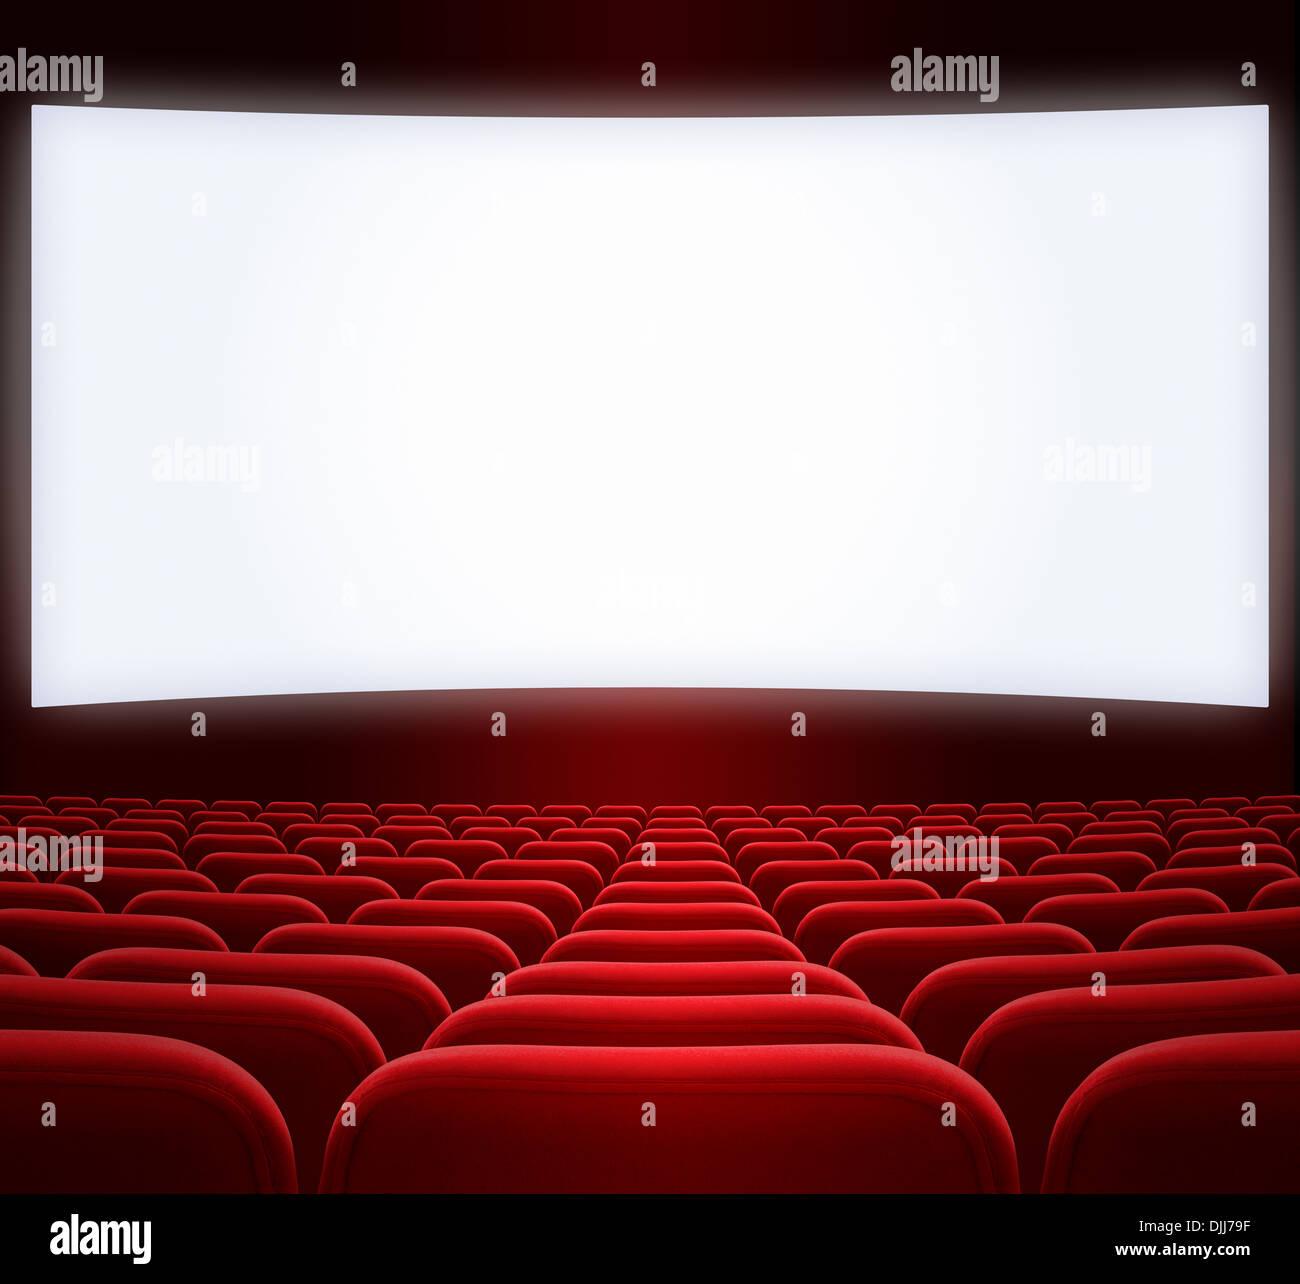 wide cinema screen - Stock Image